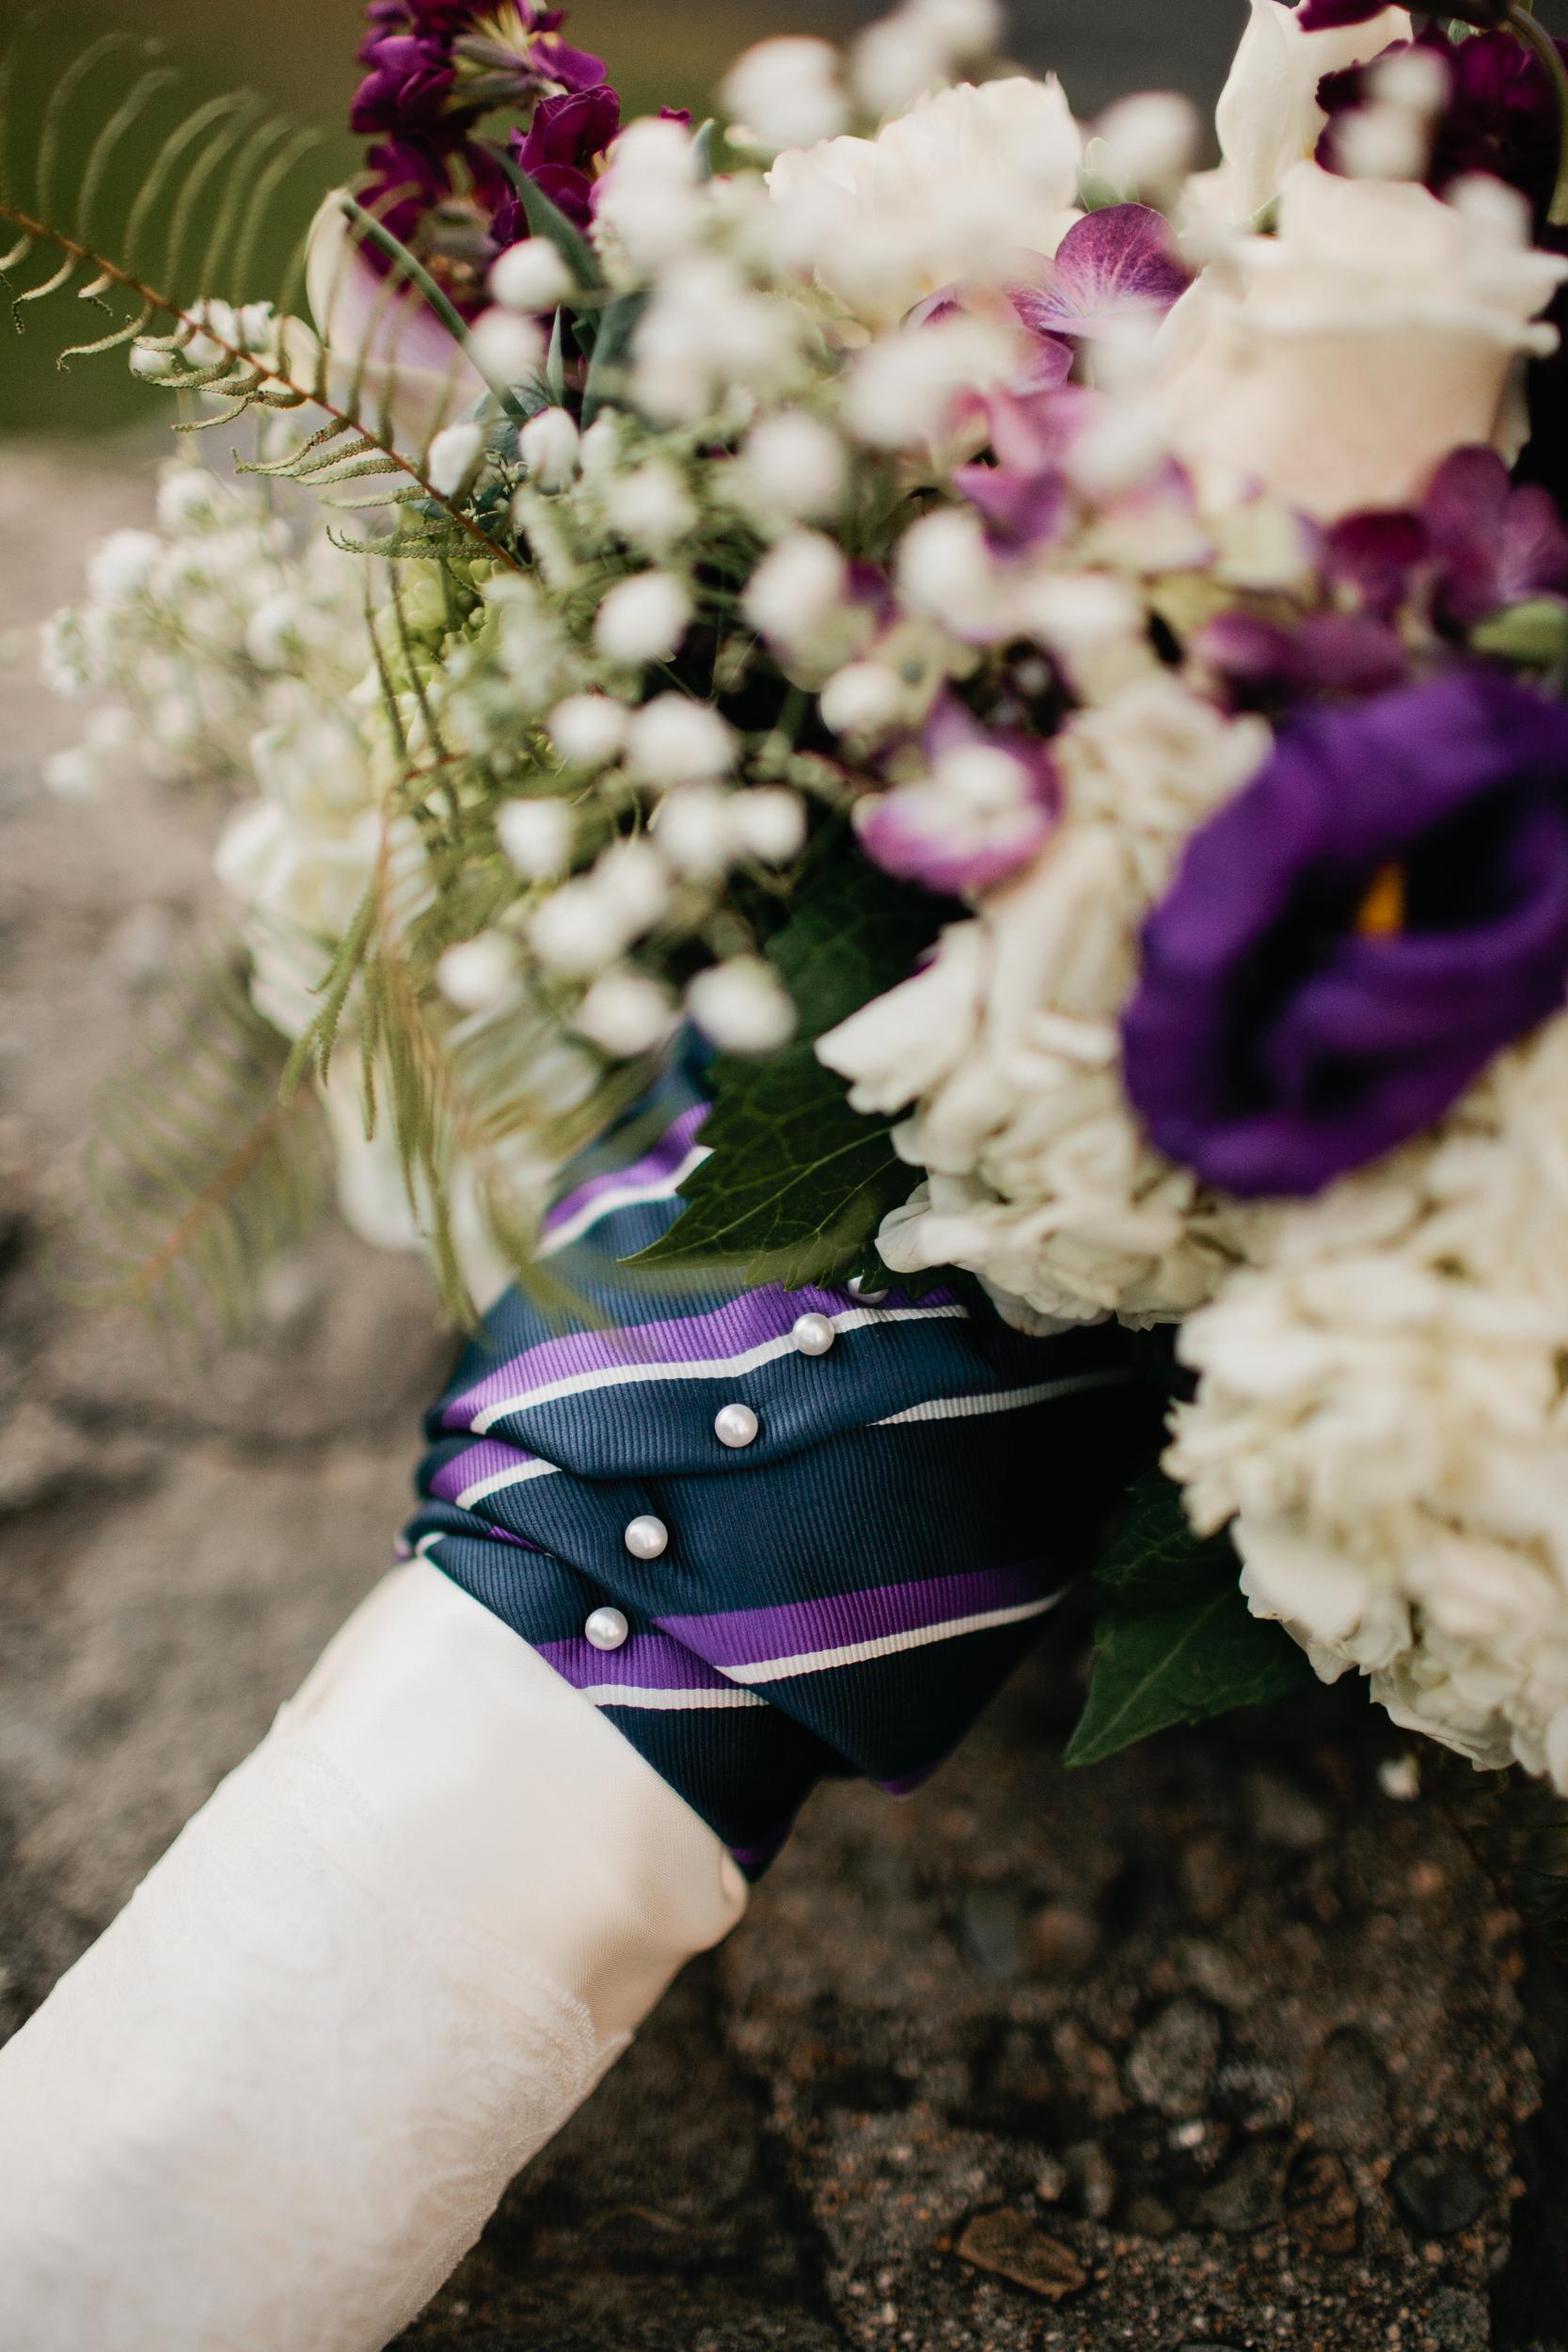 Mount-Hope-Farm-Wedding-113.jpg